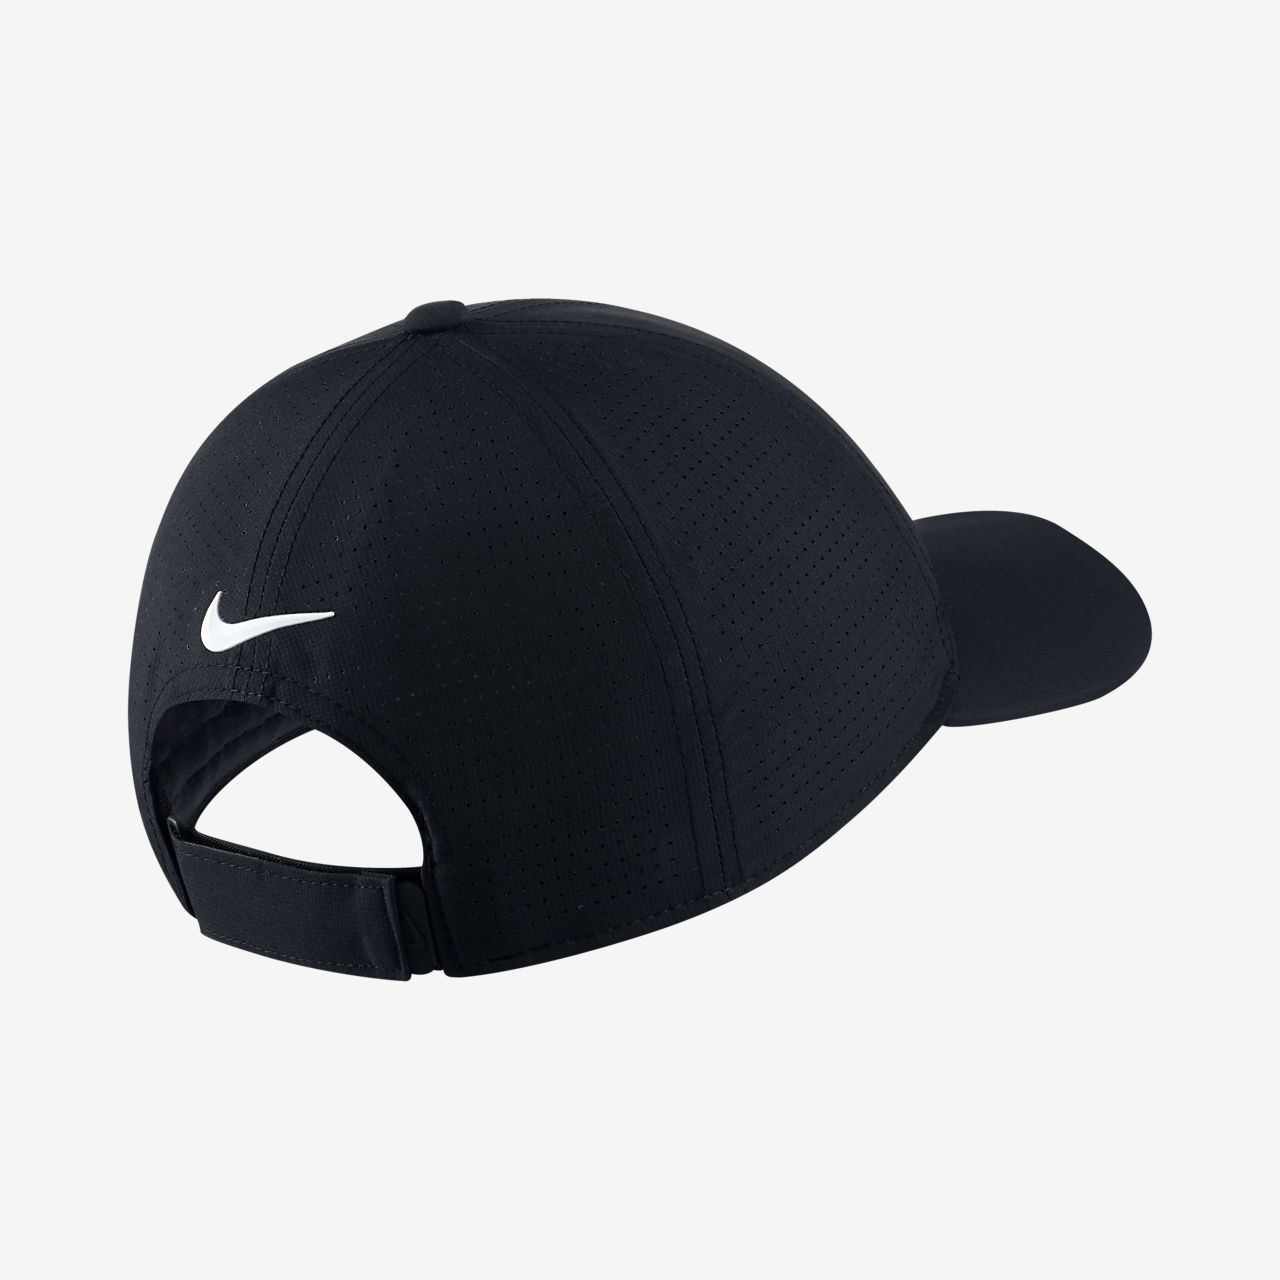 cde8e19cc241d Nike AeroBill Legacy91 Women s Golf Hat. Nike.com SG